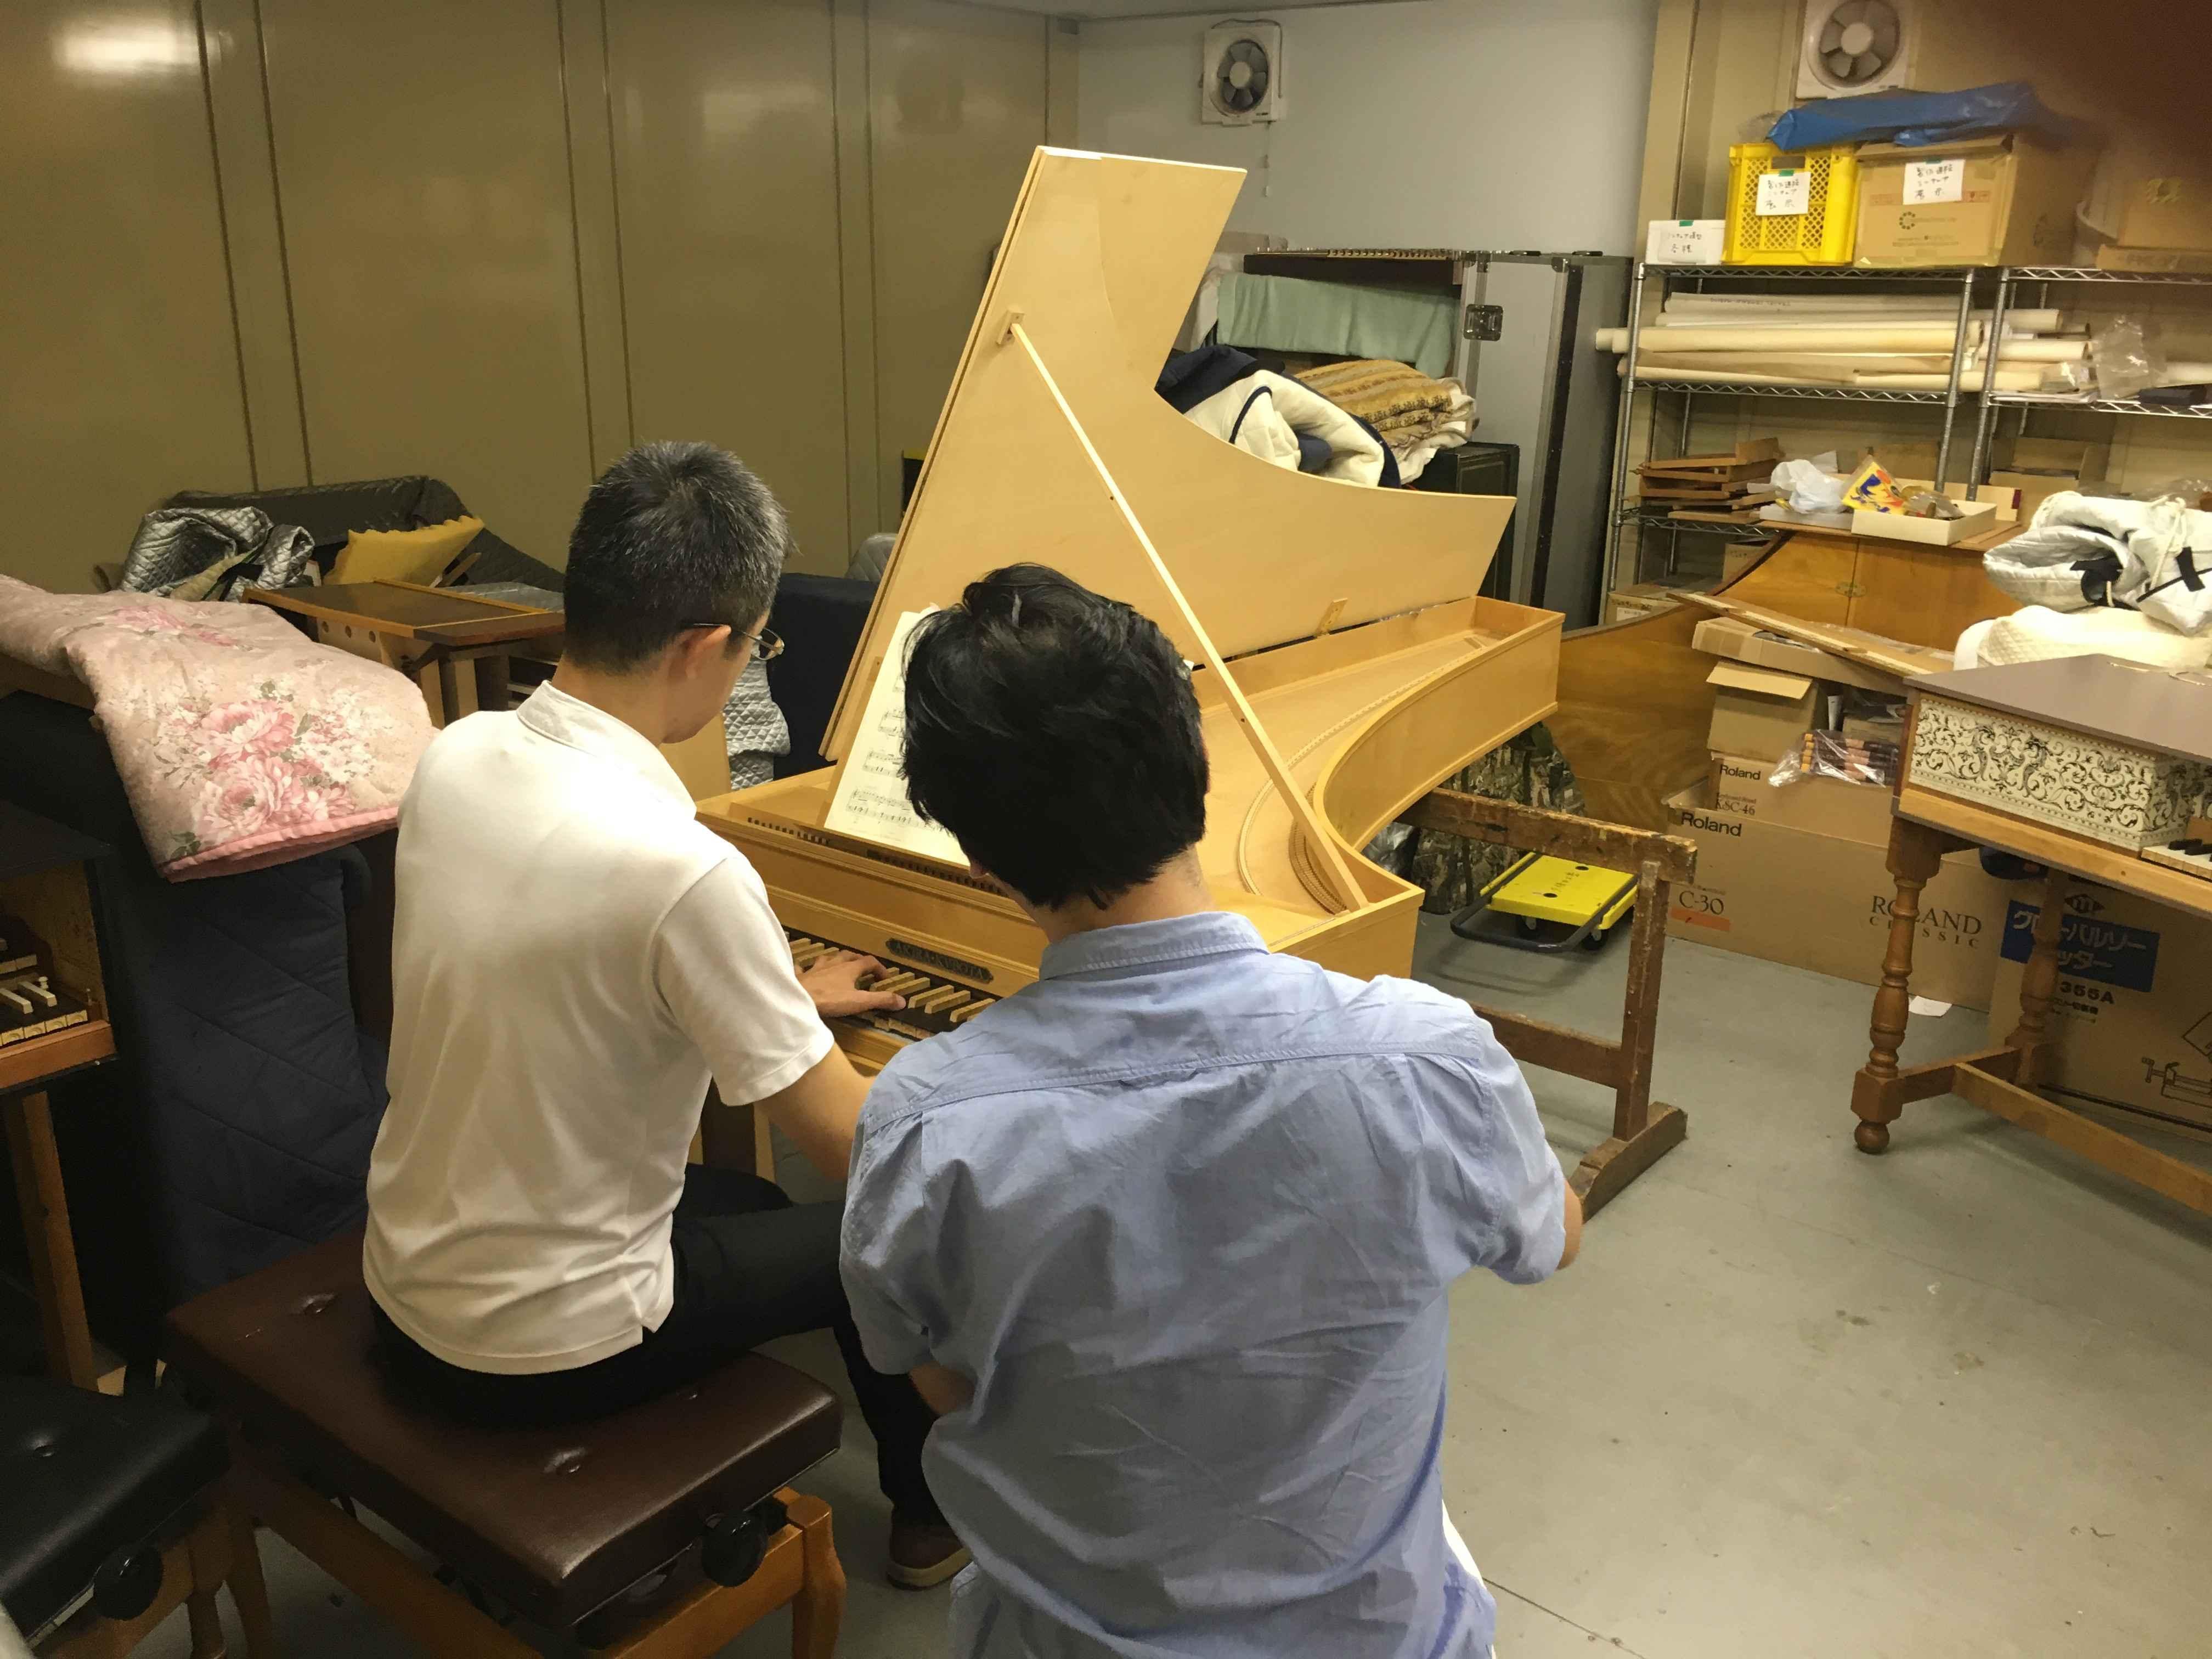 O'Harasフォルテピアノレッスン埼玉教室